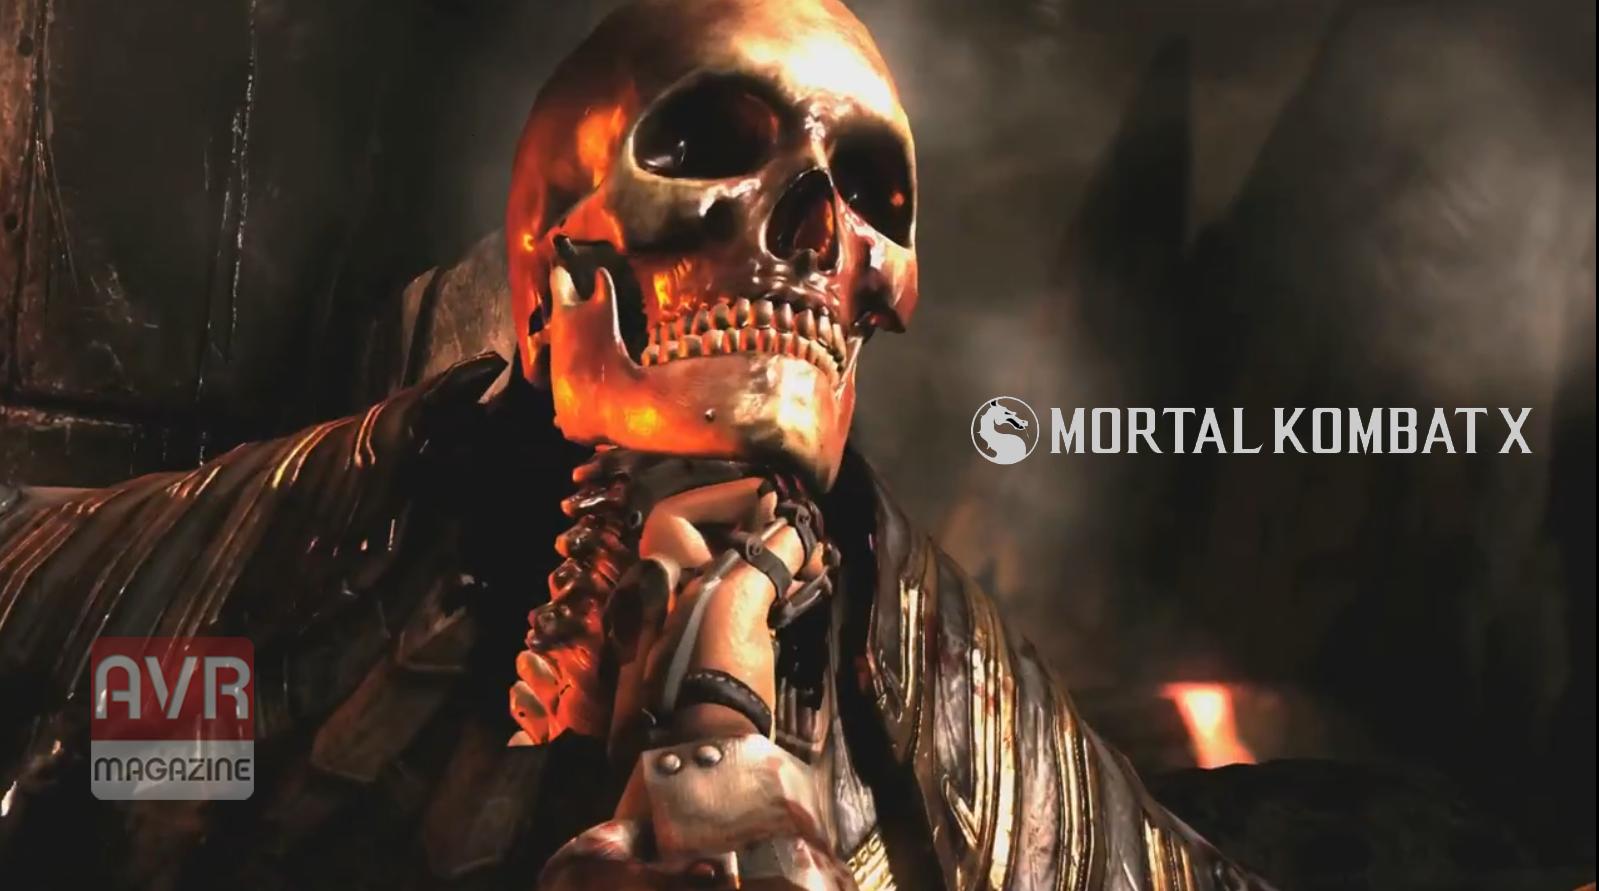 Mortal-Kombat-x-android-ios-avrmagazine